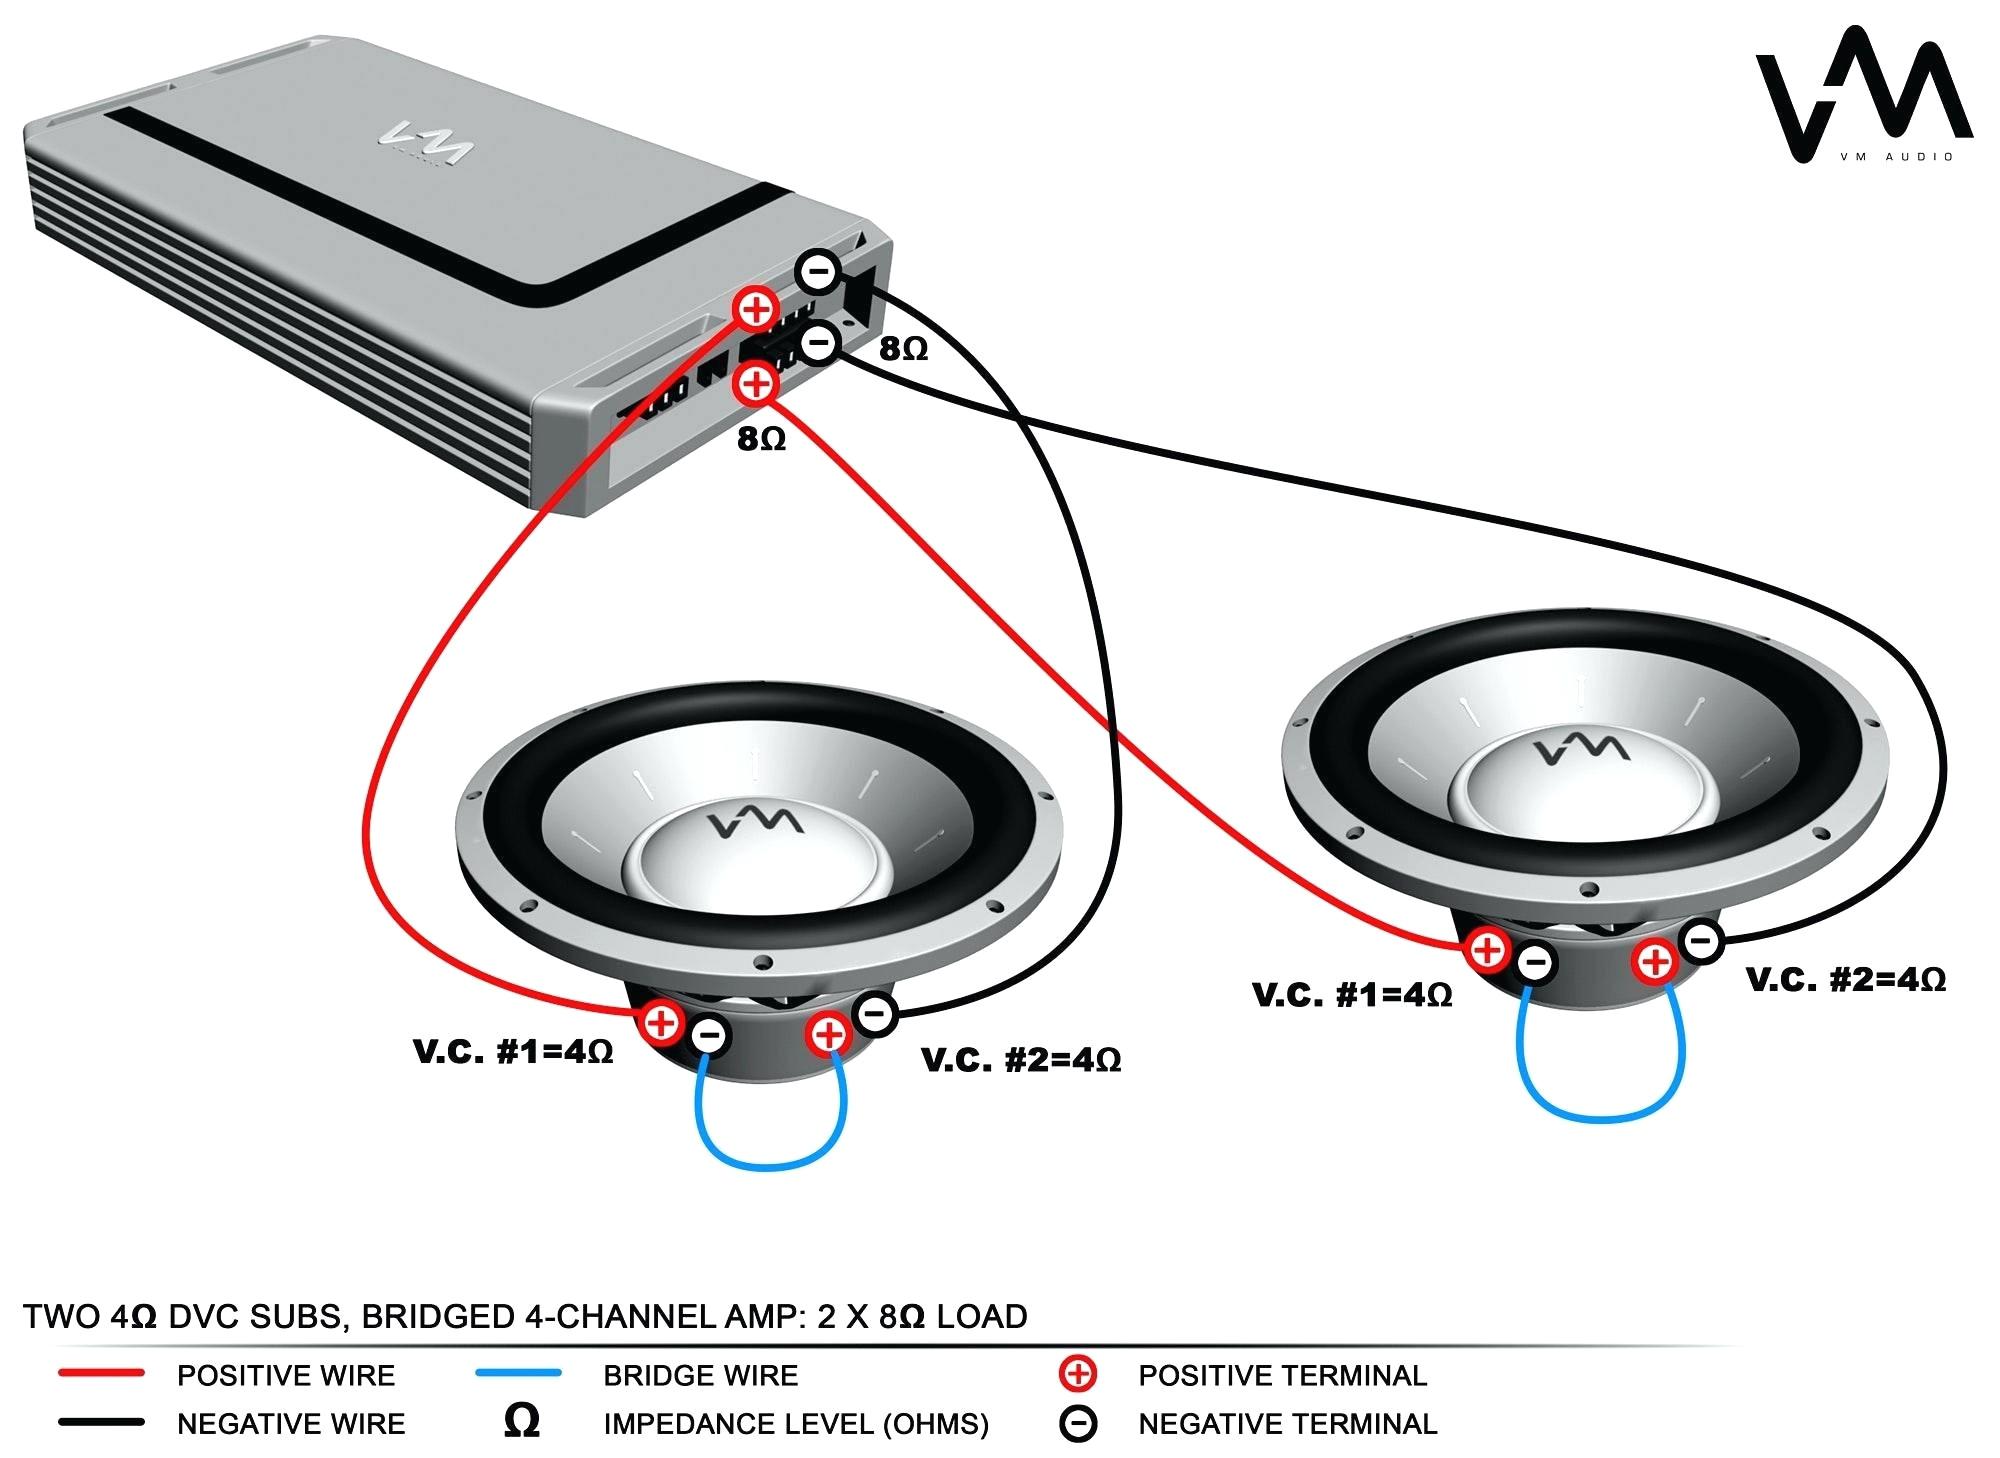 wiring diagram for kicker cvr subwoofers wiring diagram toolbox kicker cvr 12 4 ohm wiring diagram cvr 12 wiring diagram